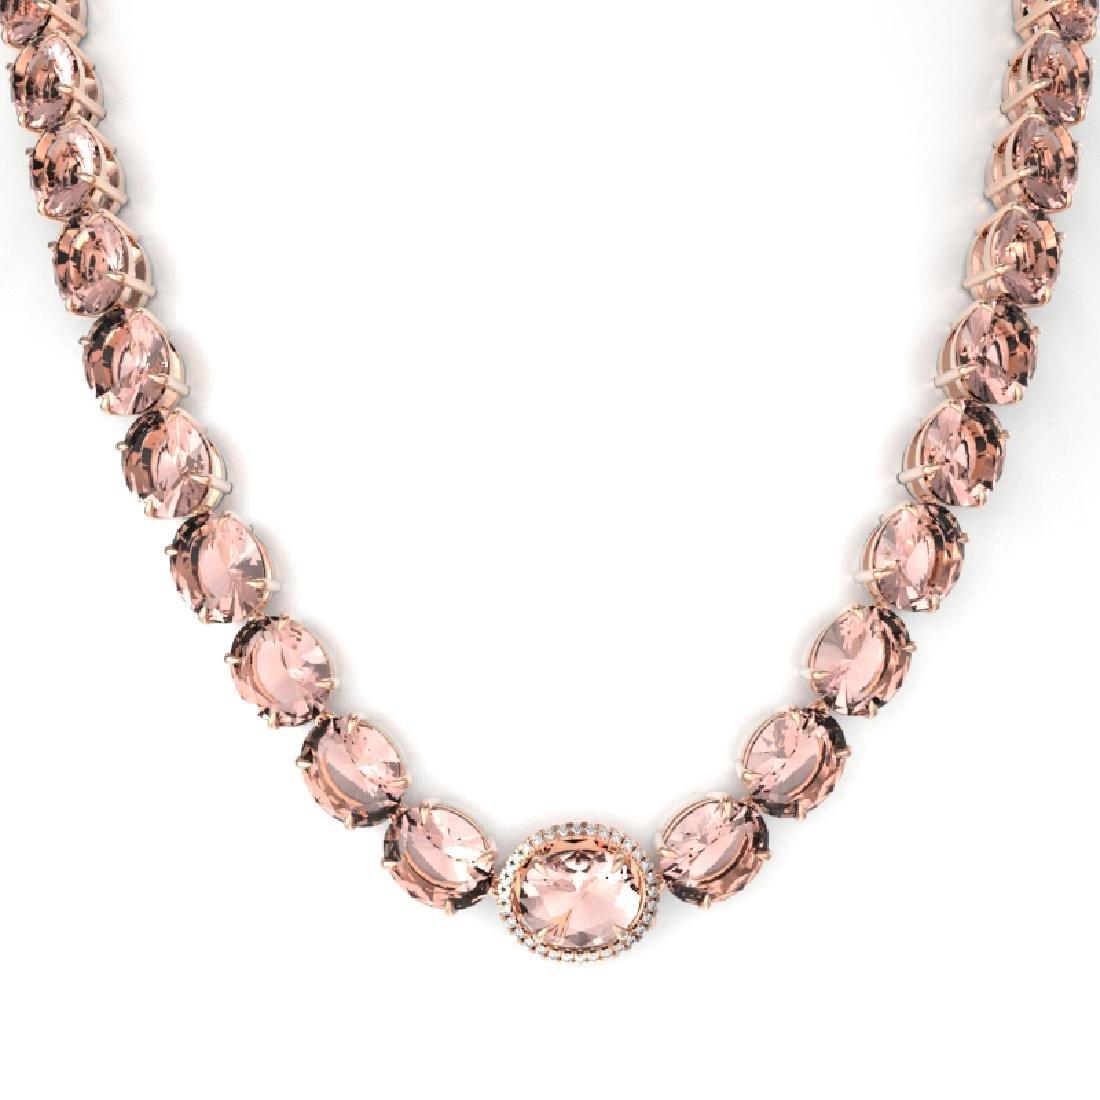 148 CTW Morganite & VS/SI Diamond Pave Necklace 14K - 2